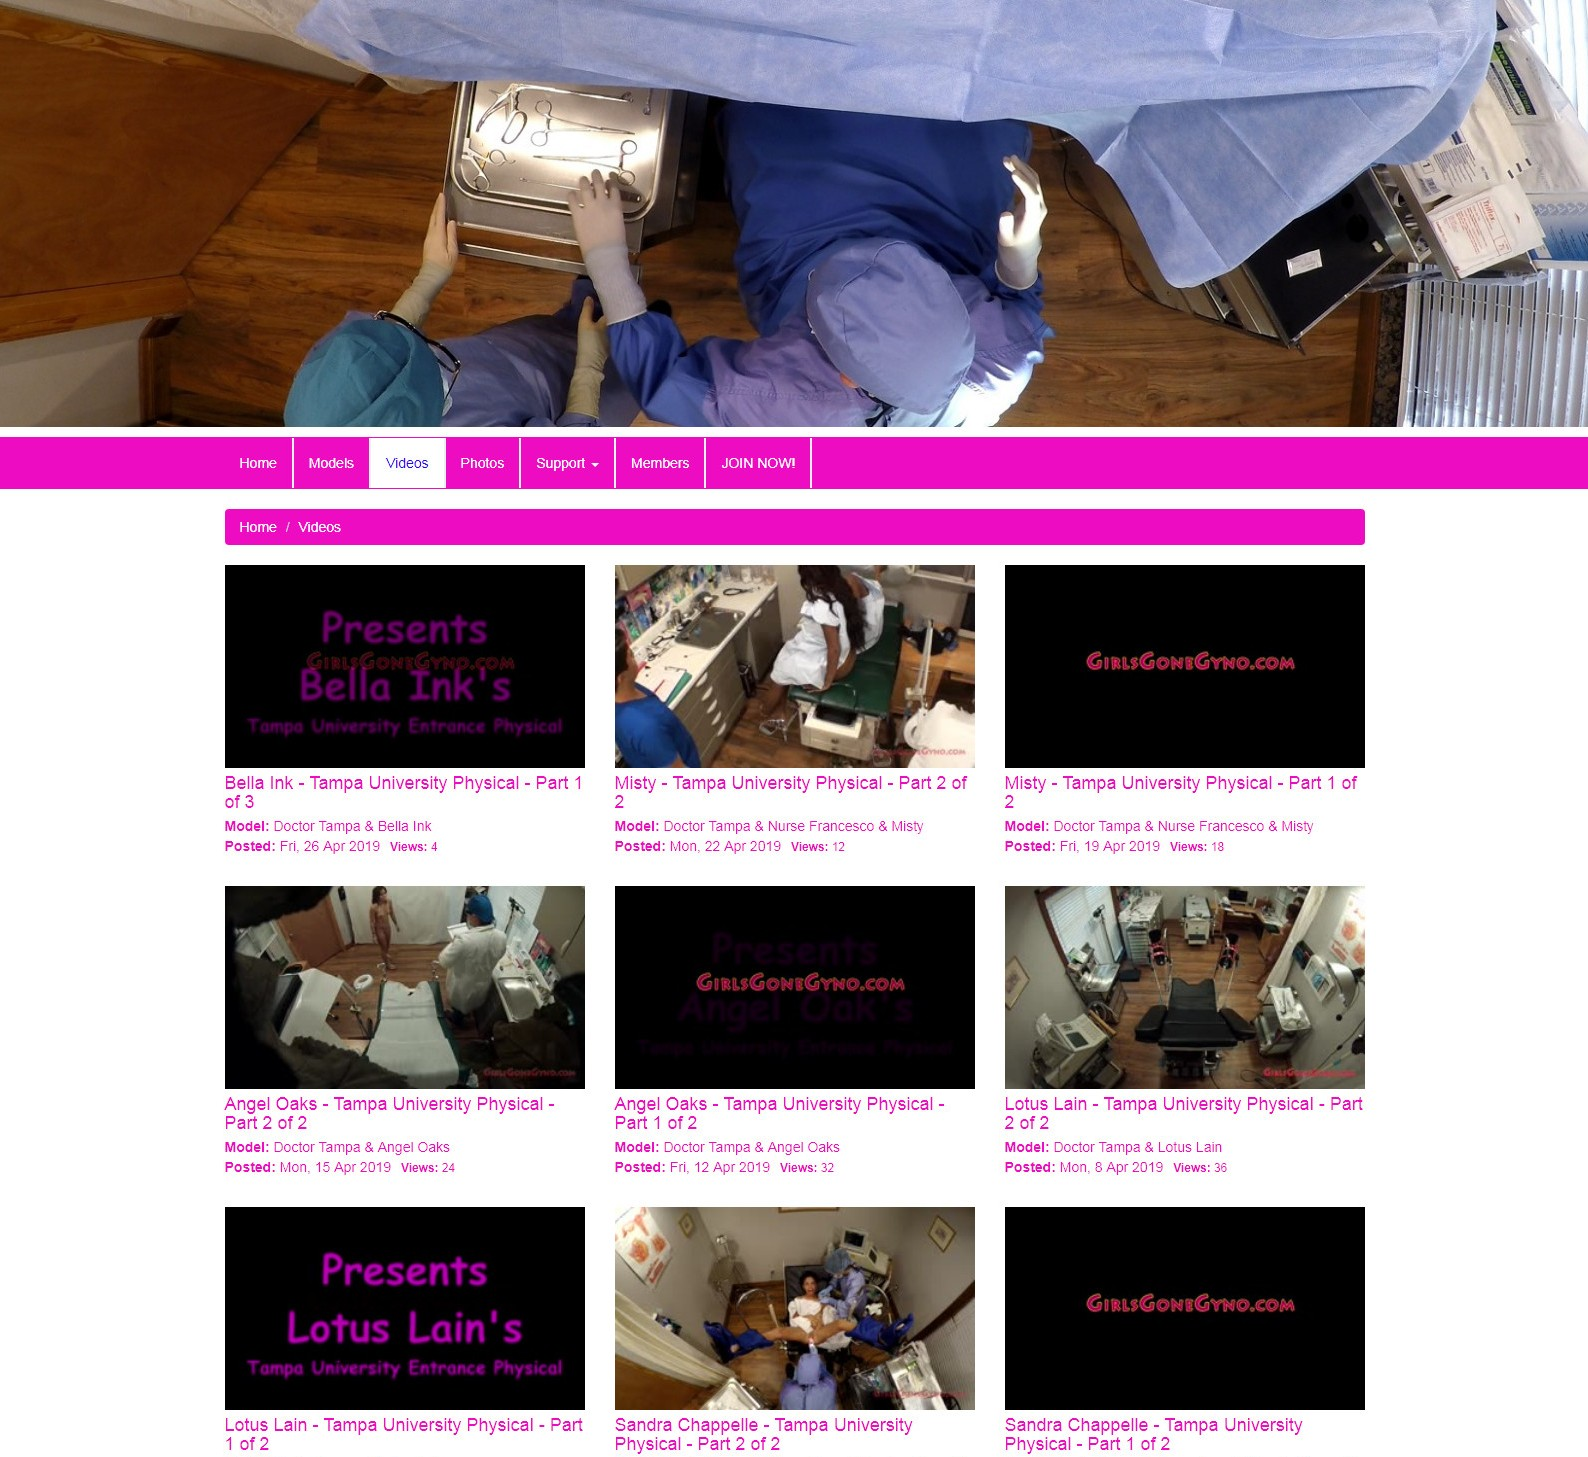 GirlsGoneGyno.com - SITERIP (32) [Medical Fetish, Gyno Exam, Speculum]